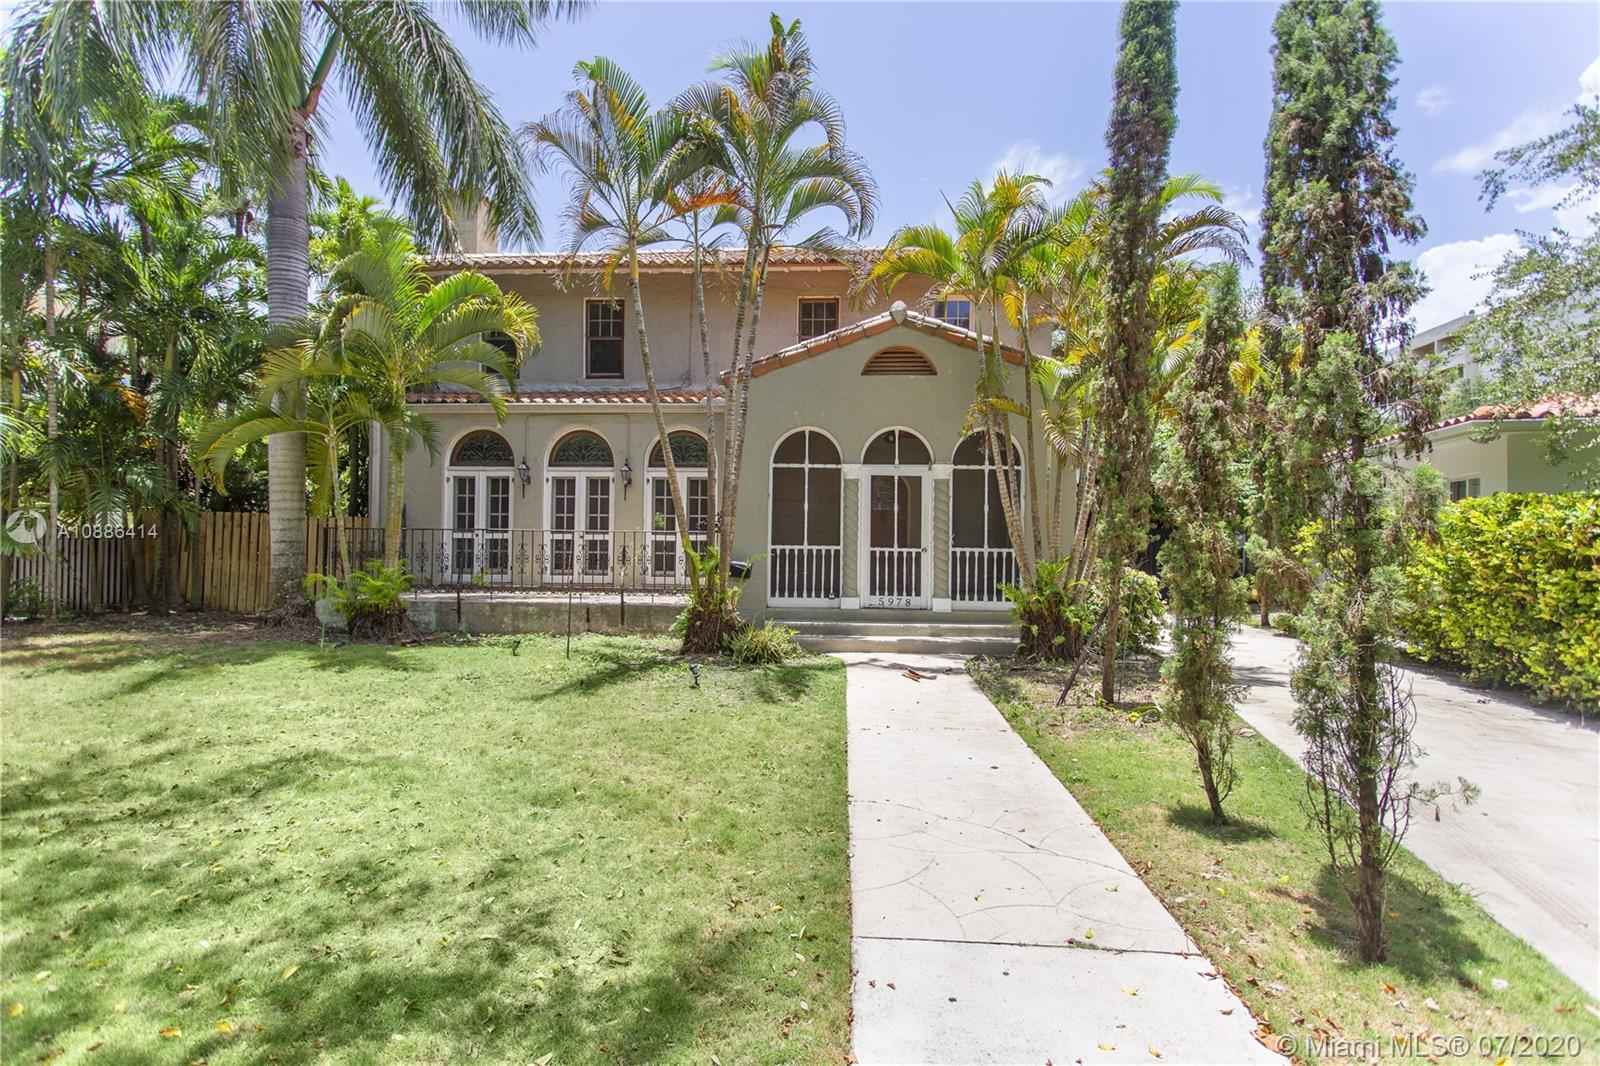 5978 NE 6th Ct, Miami, Florida 33137, 4 Bedrooms Bedrooms, ,3 BathroomsBathrooms,Residential,For Sale,5978 NE 6th Ct,A10886414